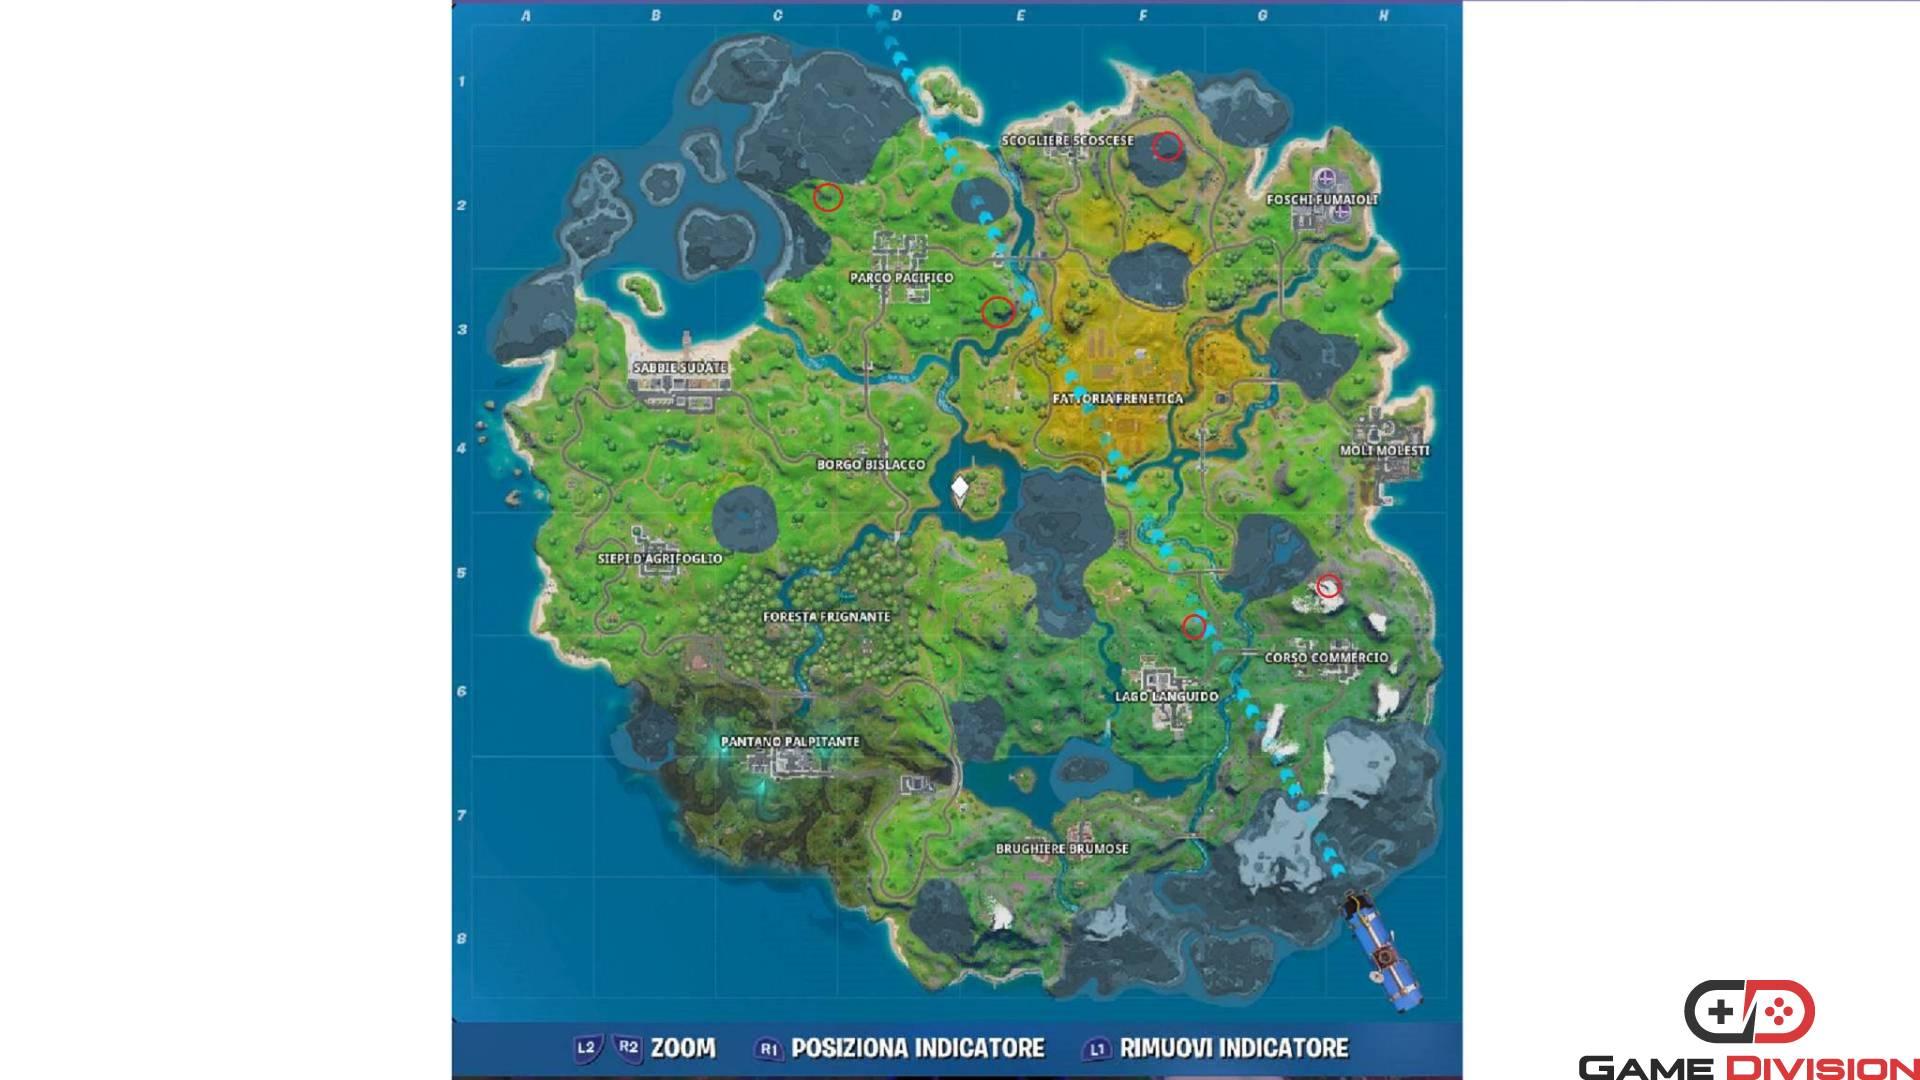 Fortnite Spada di Skye guida mappa